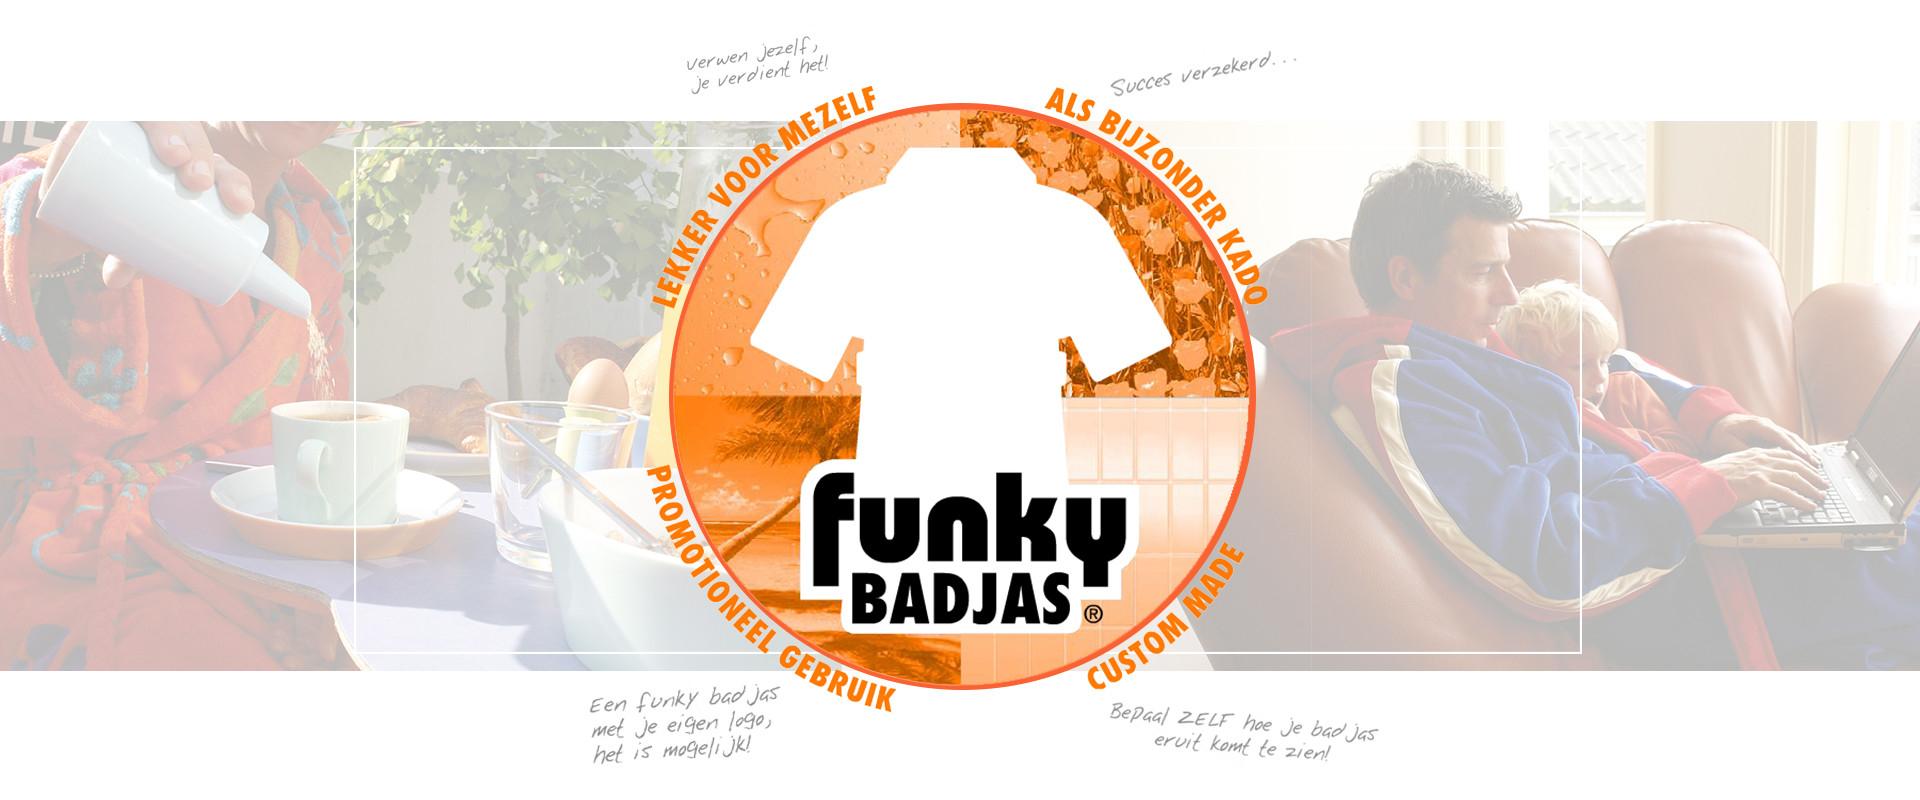 Funky badjassen